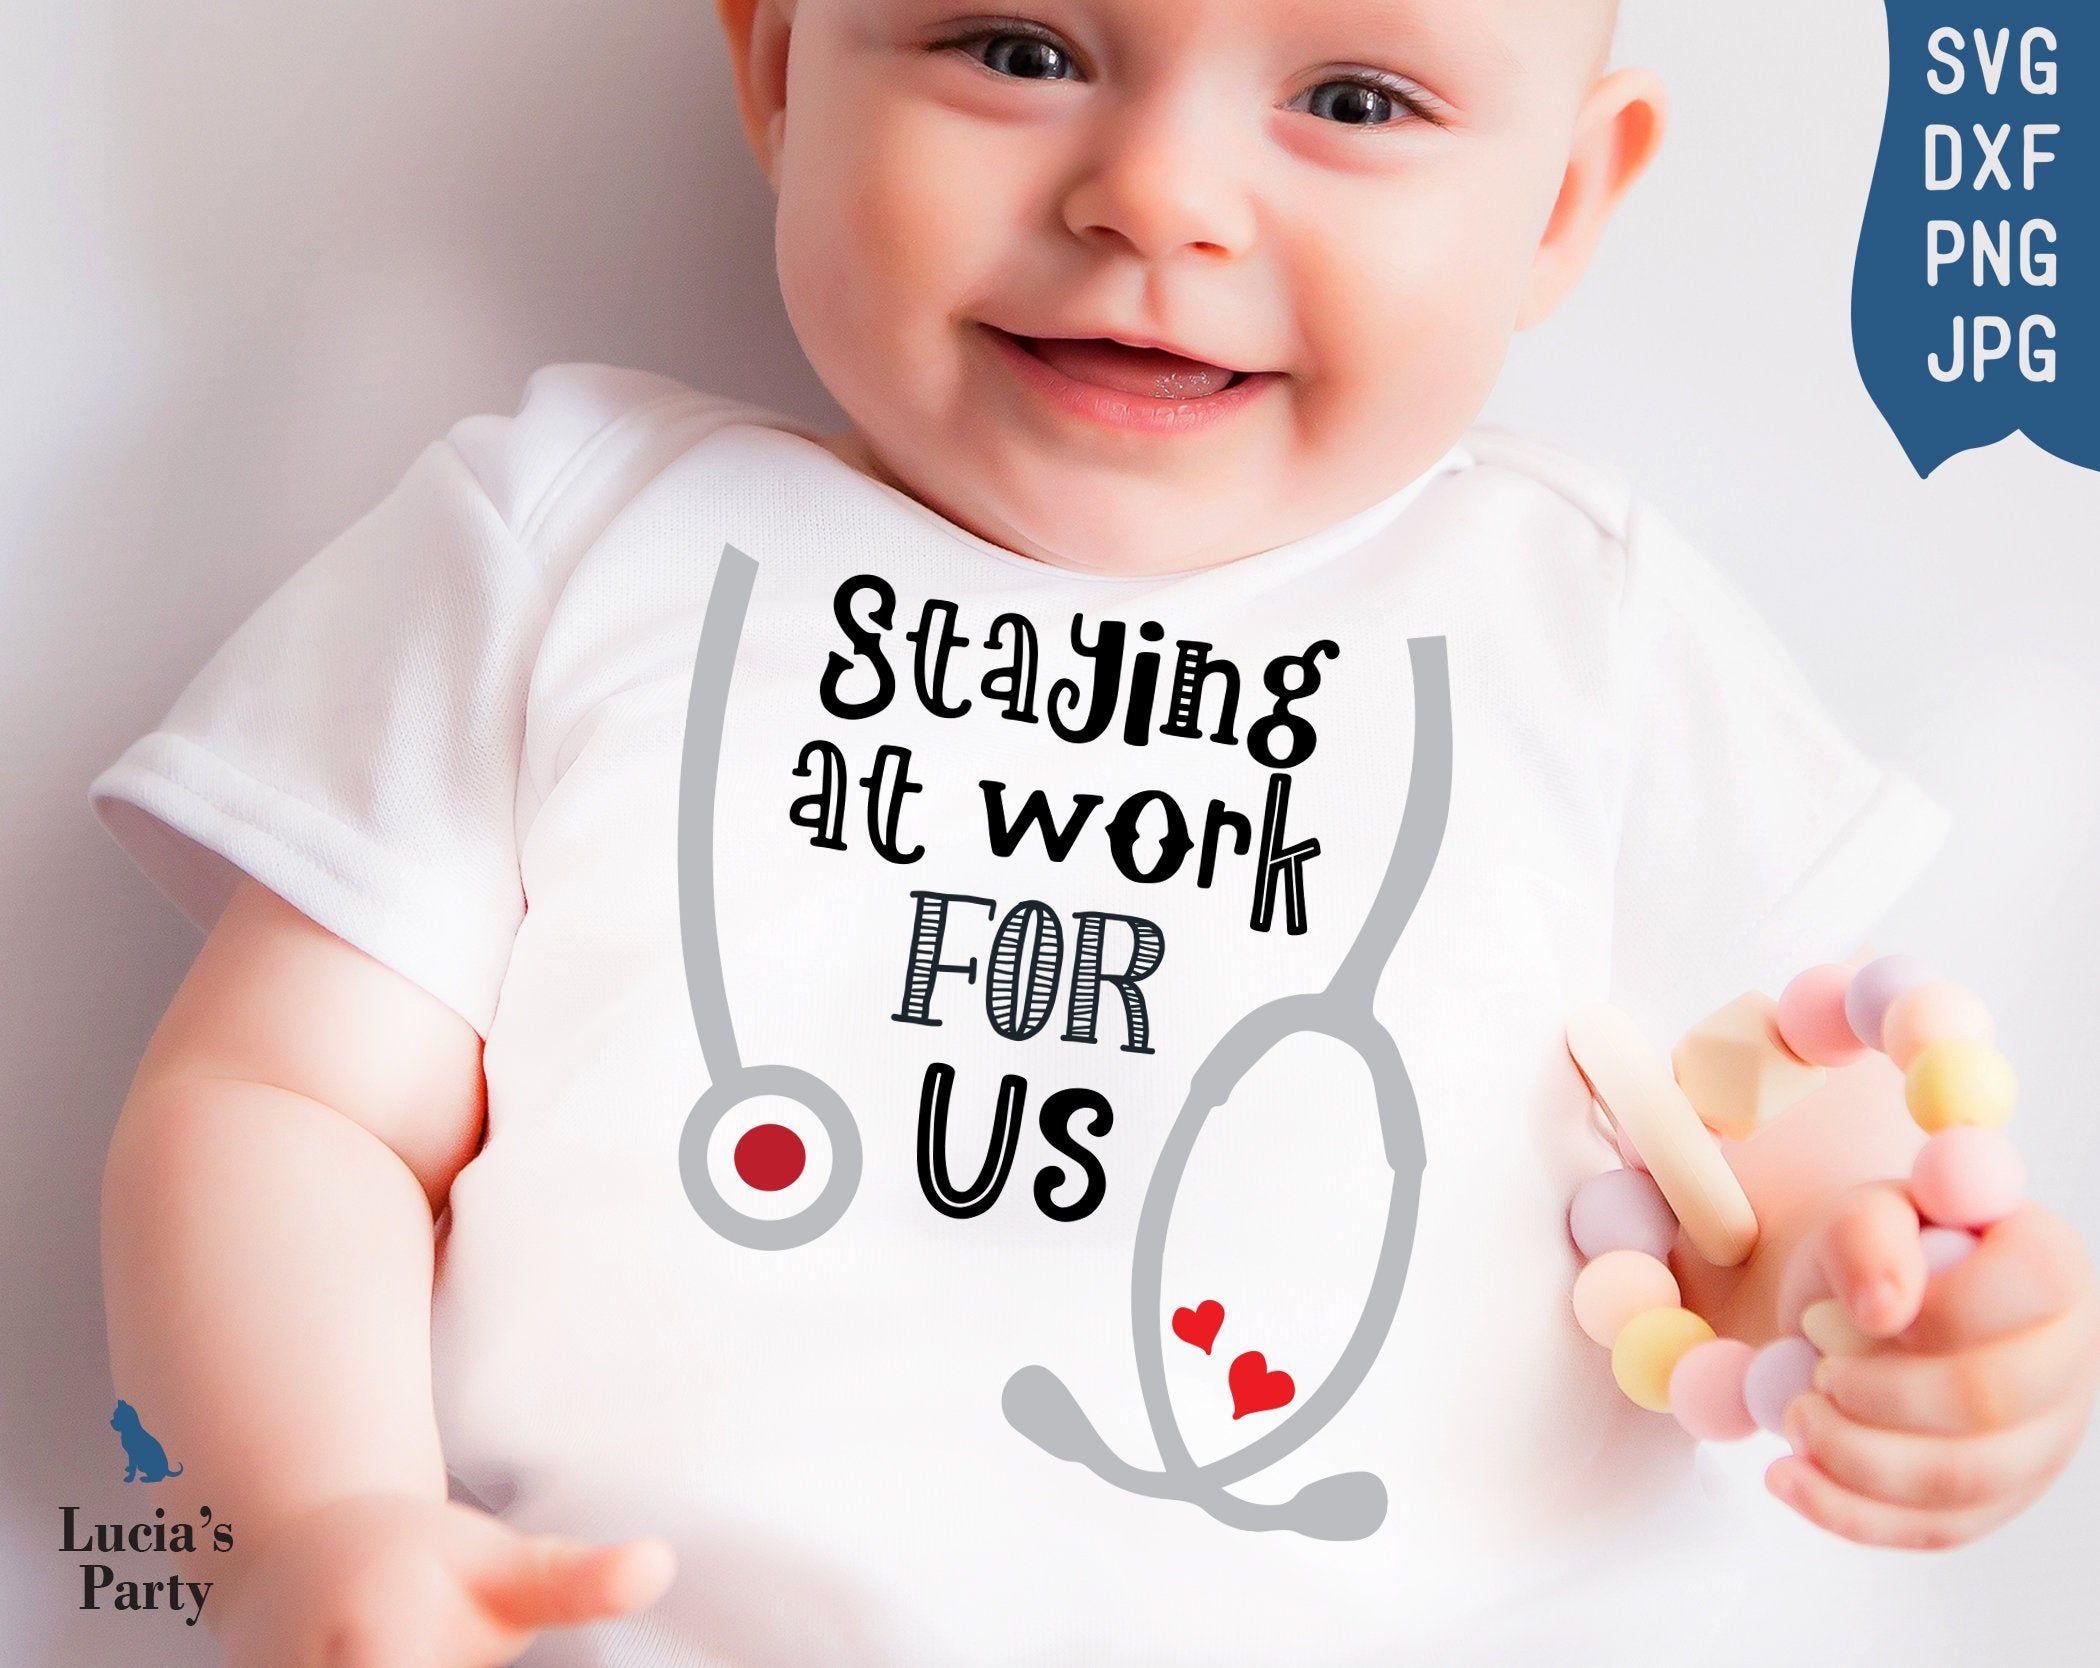 Nurse Baby Svg Nurse Svg Files For Cricut Nurse Onesie Svg Mom Nurse Onesie Funny Baby Onesie Svg Baby Boy Onesie Svg Funny Onesies Funny Baby Onesies Baby Svg